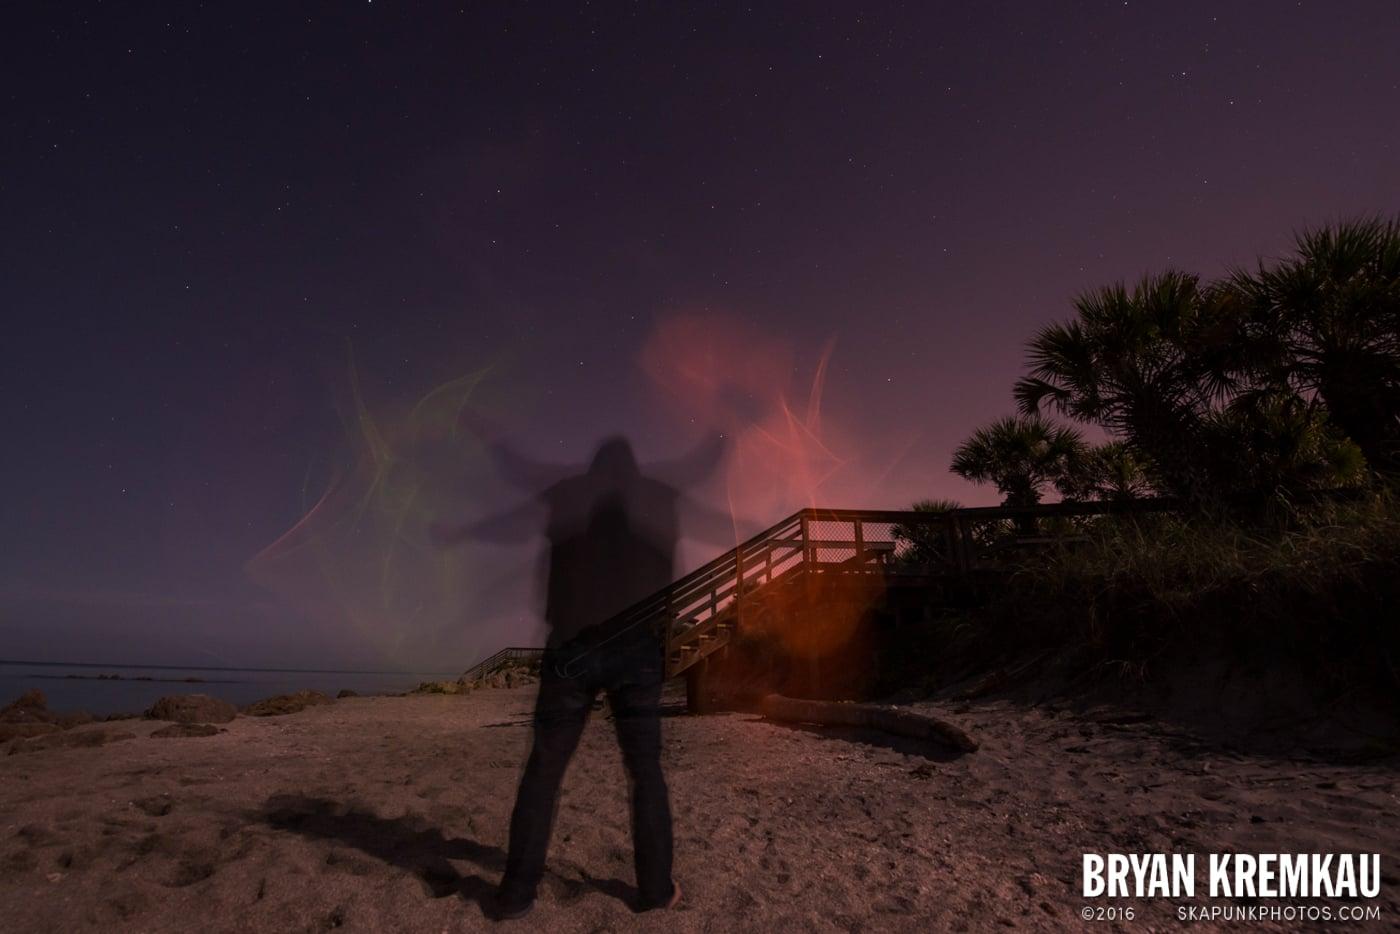 Sunsets, Astrophotography & Birds @ Venice, Florida - 10.25.14 - 11.5.14 (35)